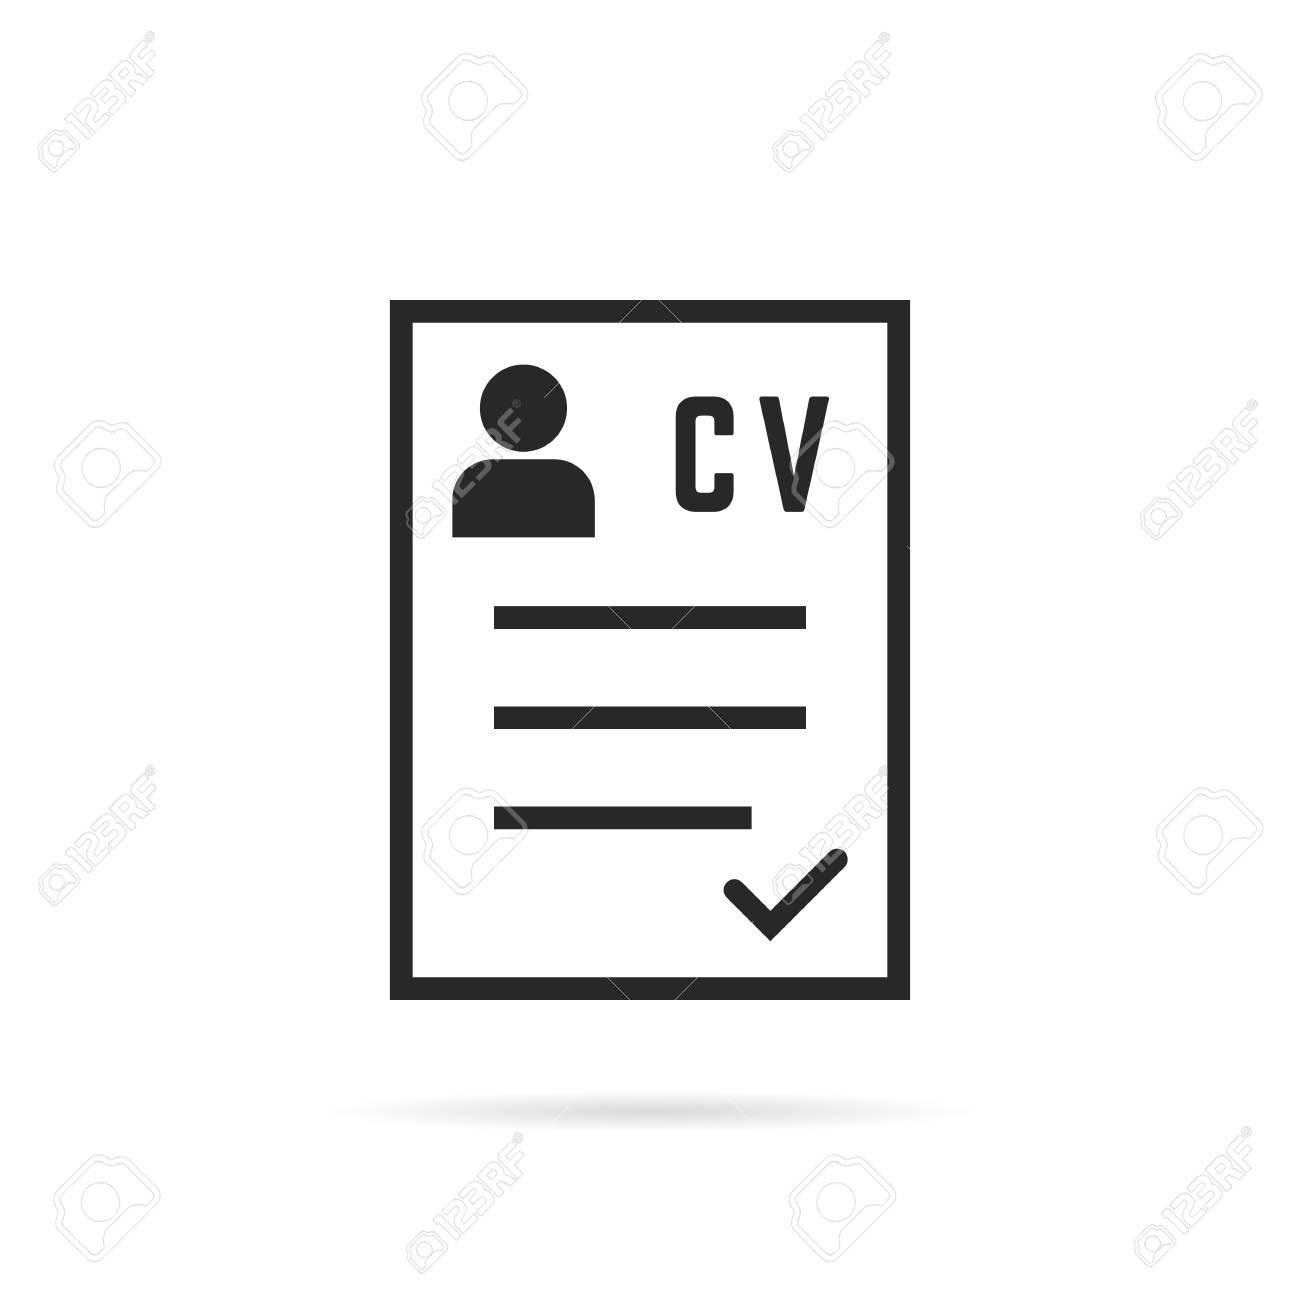 Black Thin Line Cv Icon Or Curriculum Vitae Royalty Free Cliparts